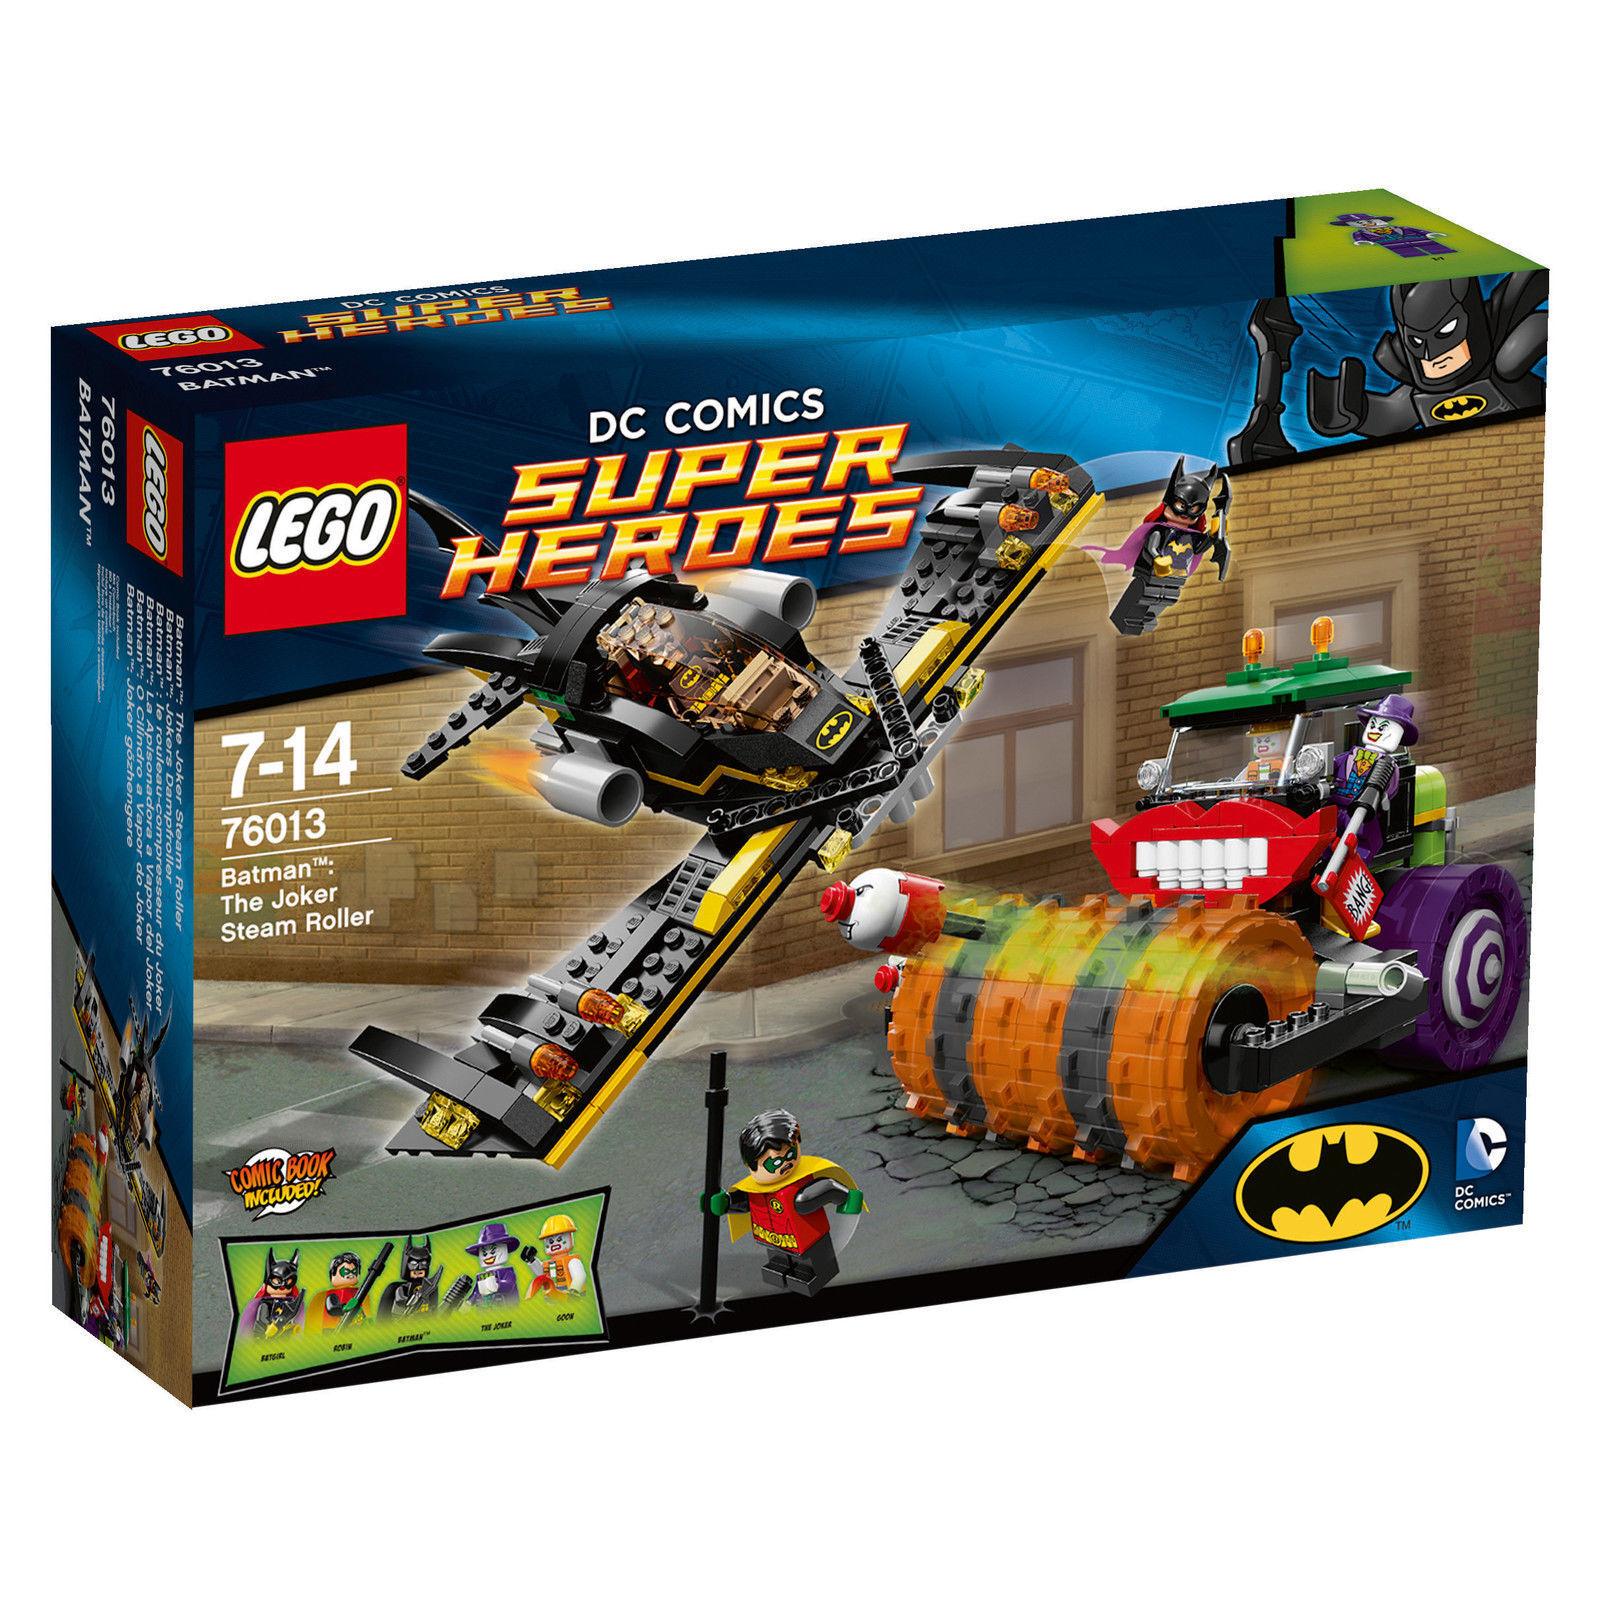 LEGO ®  76013 DC Comics Super Heroes Batuomo The Joker Ssquadra Roller Nuovo OVP nuovo  bellissima